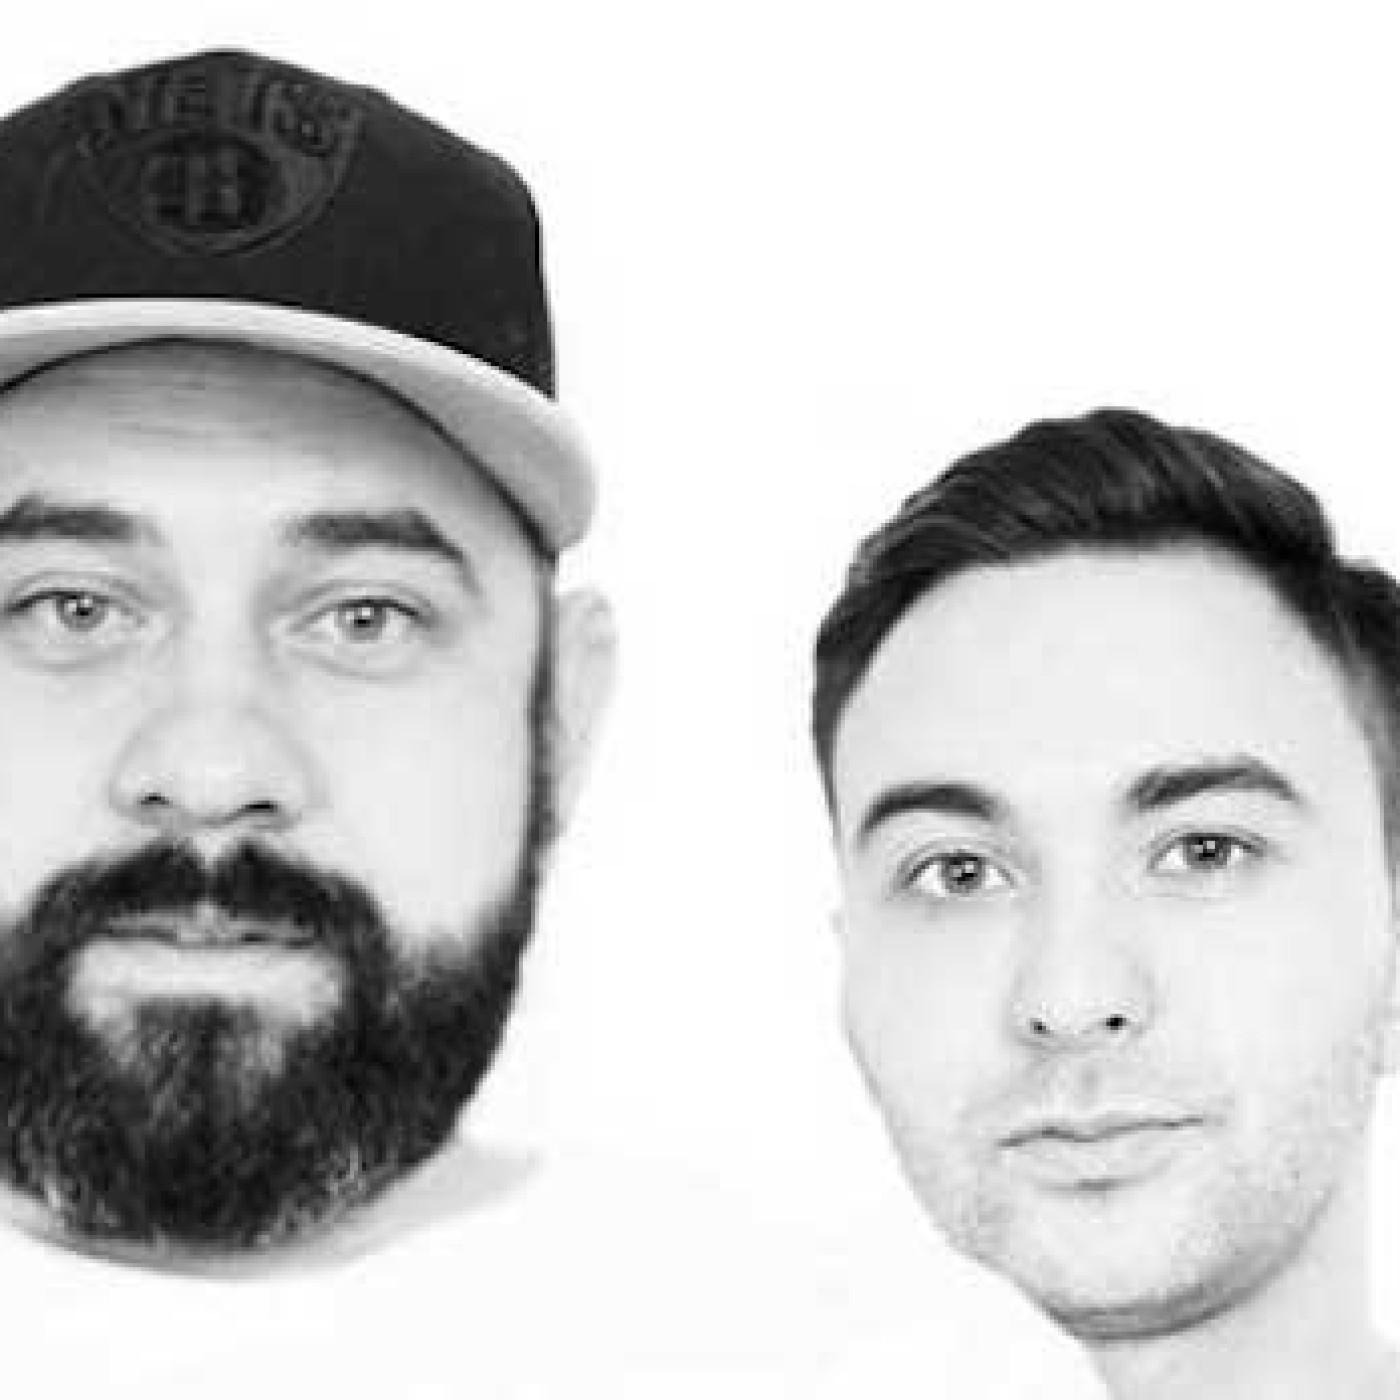 La music story du jour : Leftwing & Kody